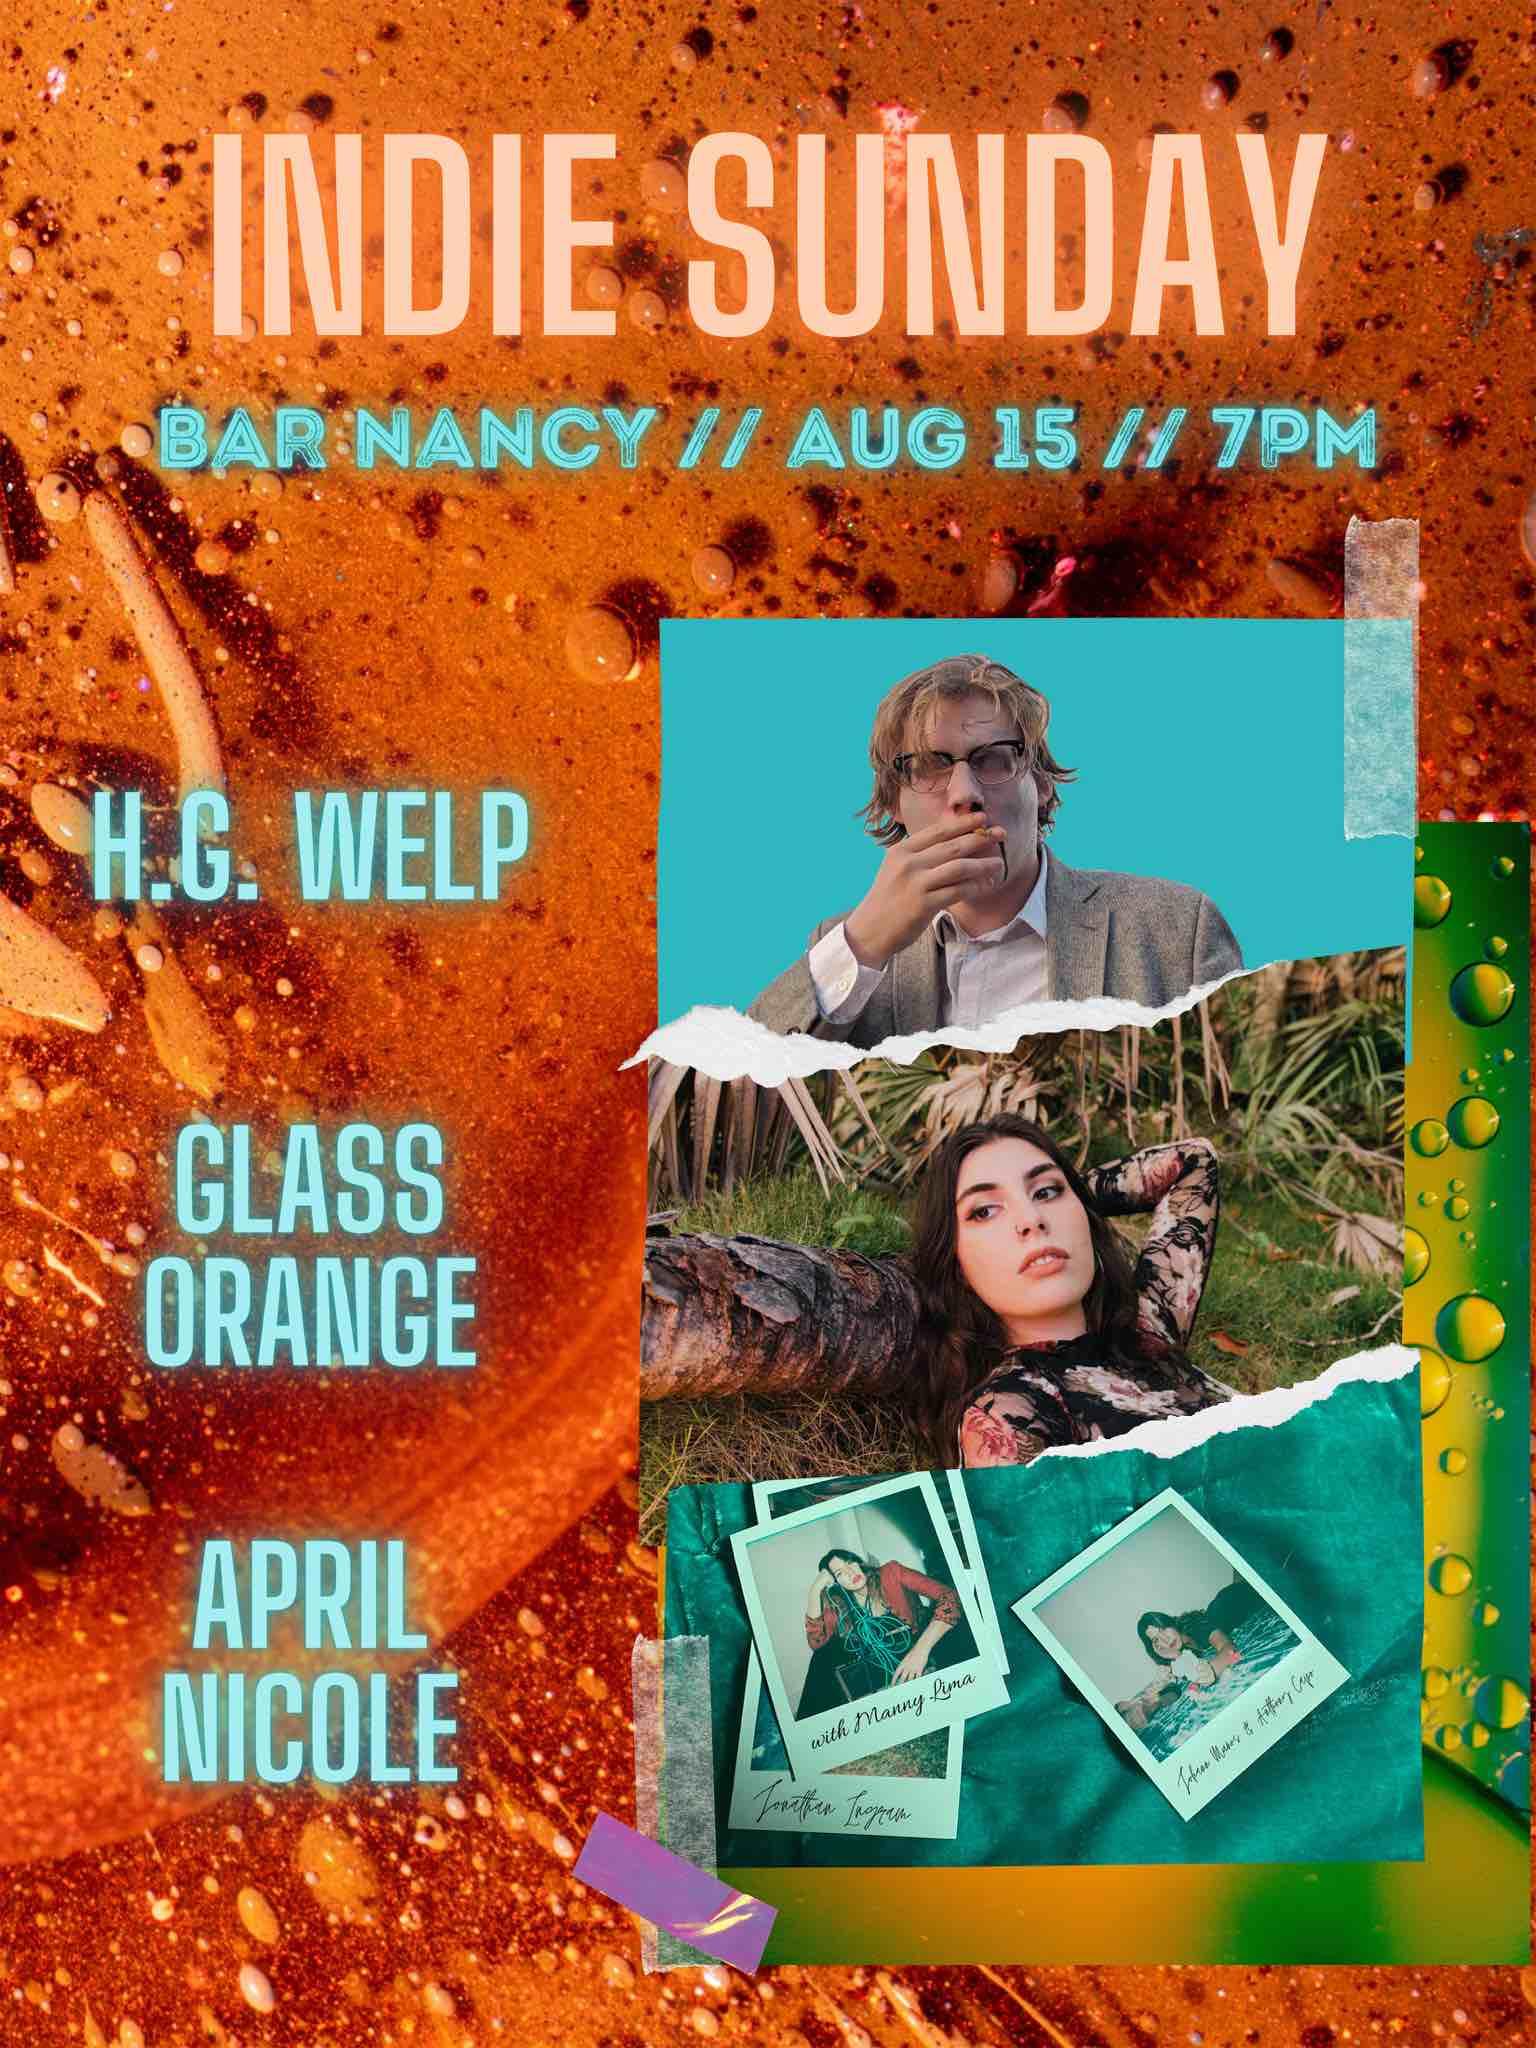 Indie Sunday at Bar Nancy - H.G. Welp - Glass Orange - April Nicole